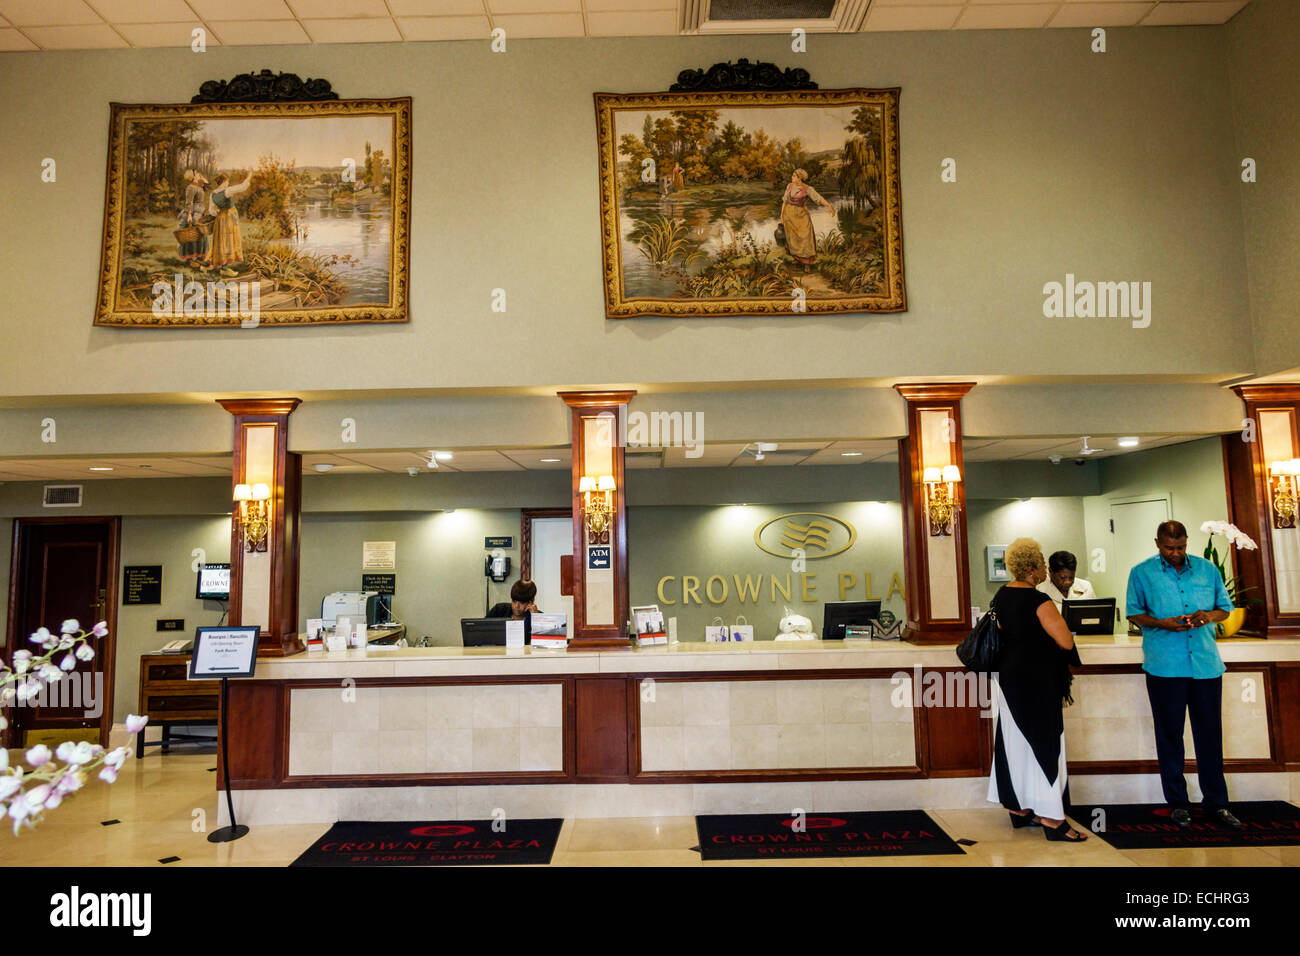 st  louis missouri saint clayton crowne plaza hotel chain